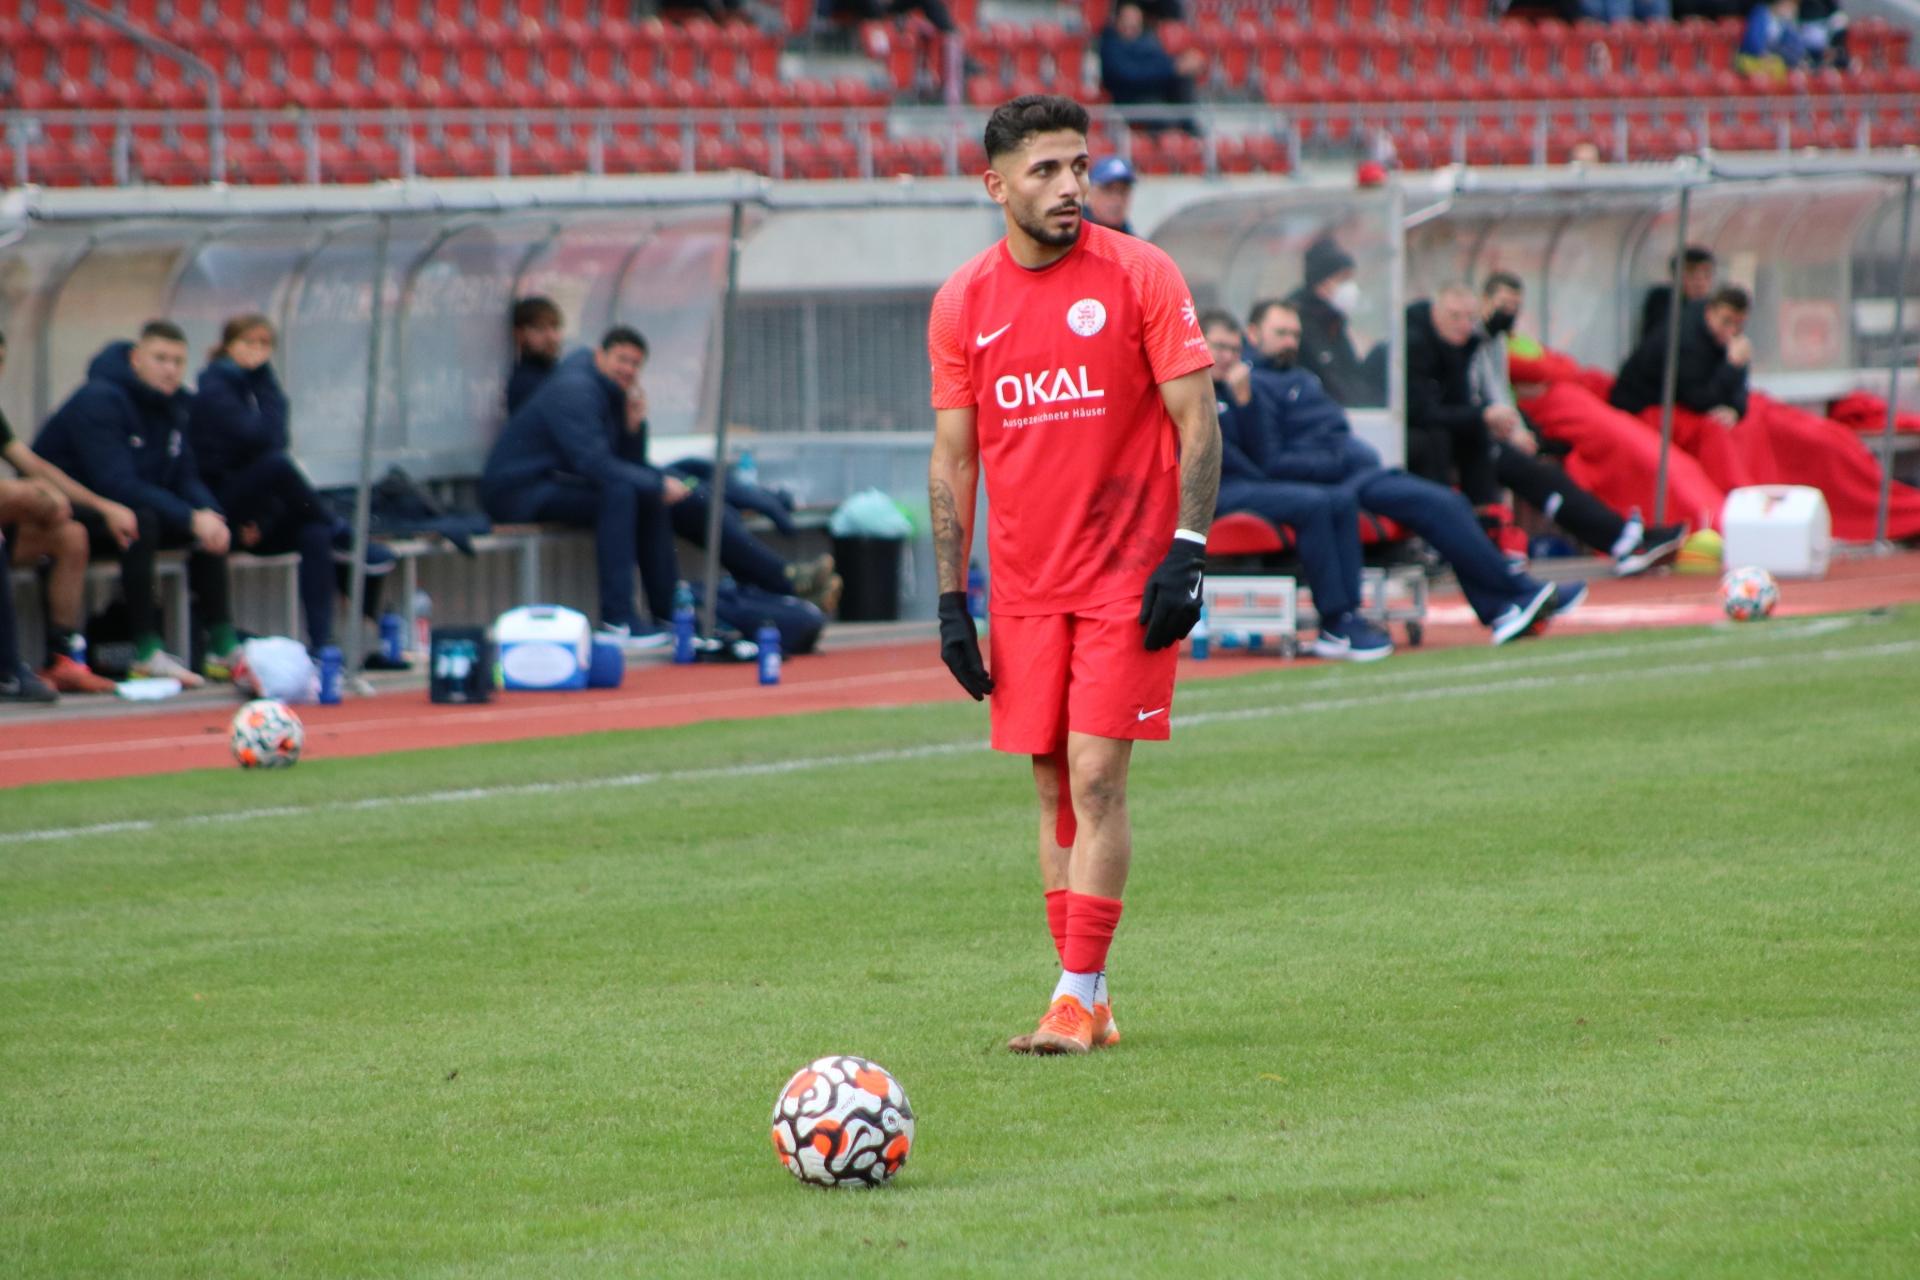 KSV tritt am Dienstag beim FK Pirmasens an